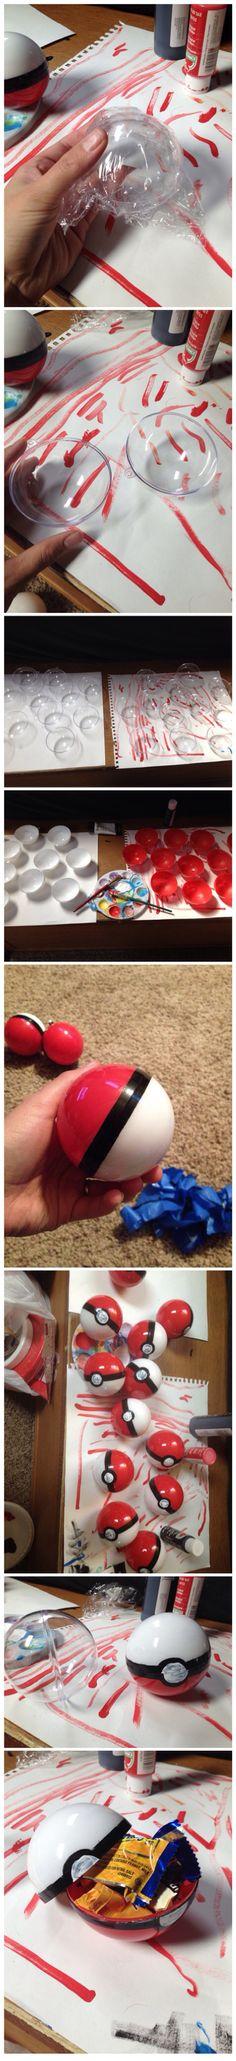 Pokemon themed party; diy pokeballs!!